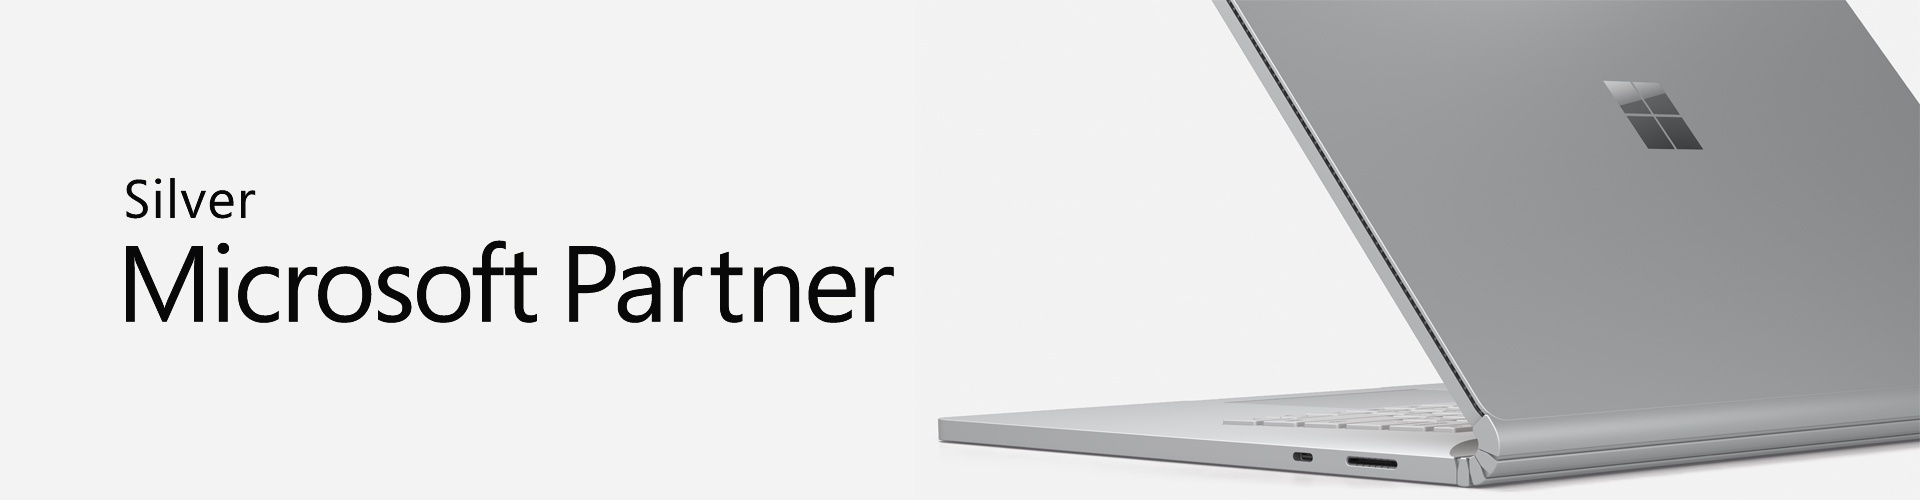 Microsoft Silver Partner banner